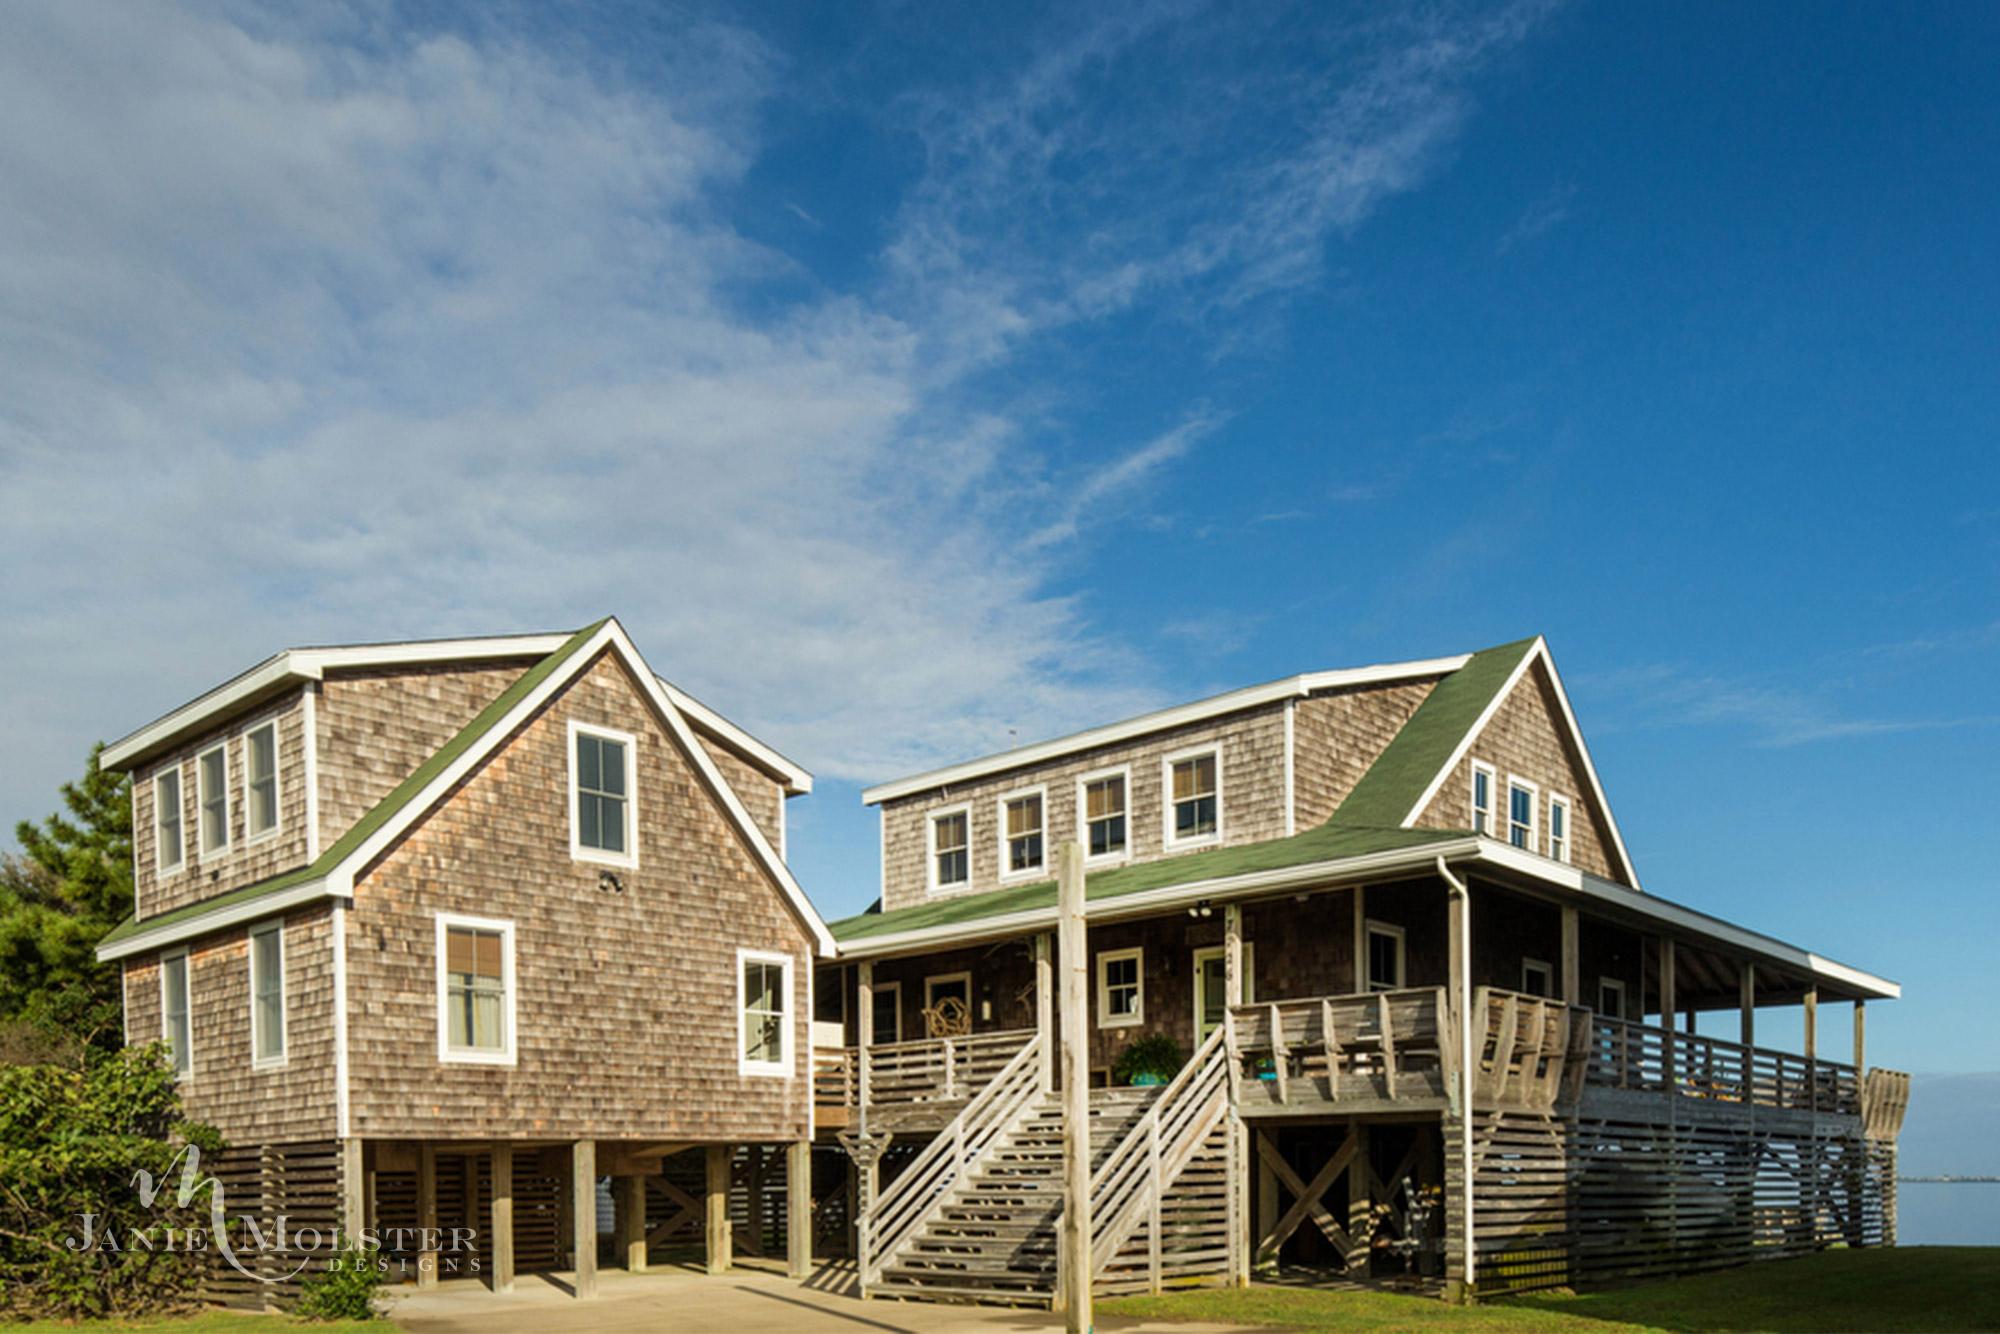 Carolina cottage janie molster designs for Carolina cottage house plans